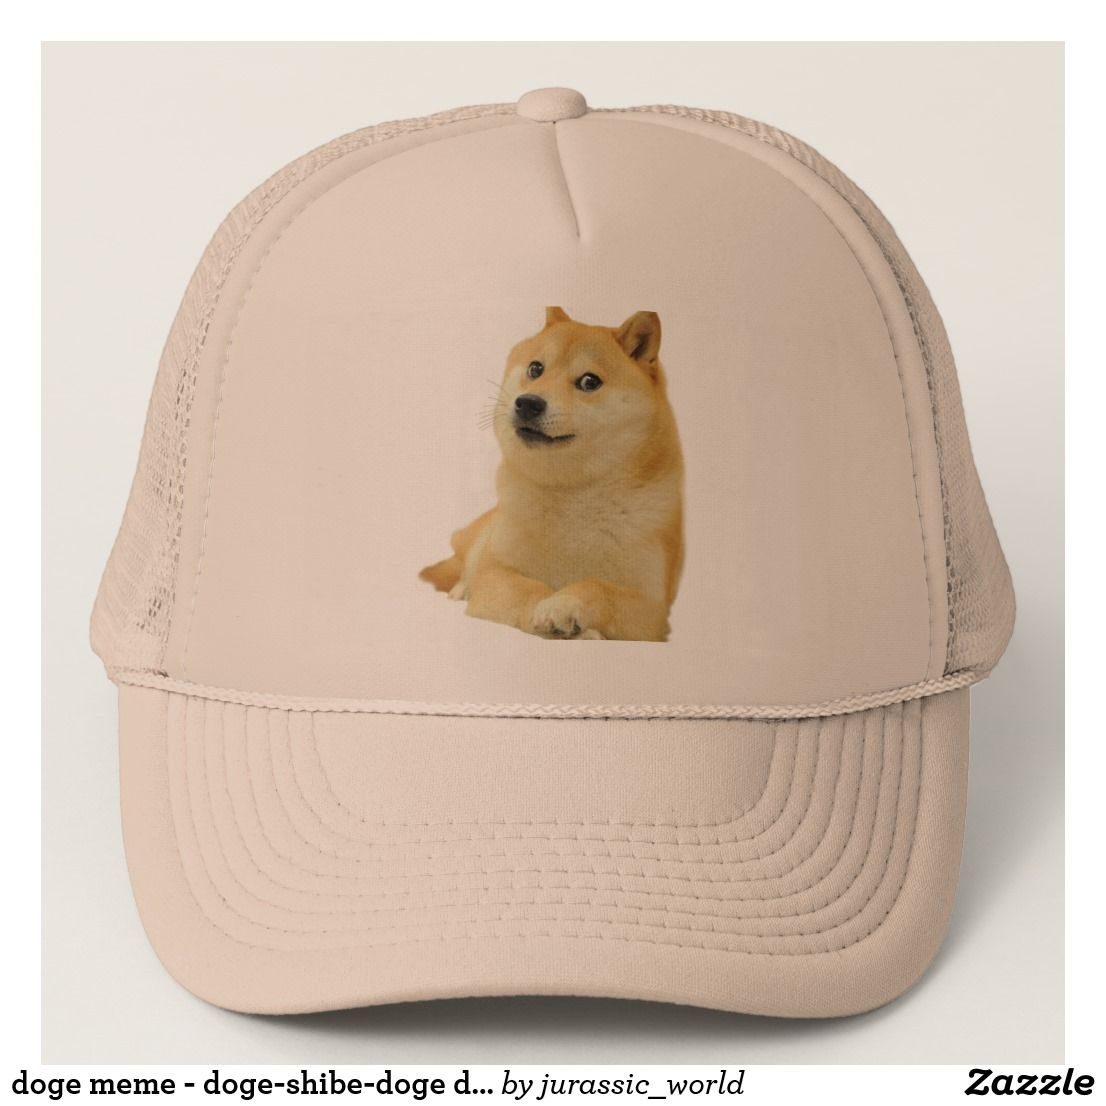 Doge Meme Doge Shibe Doge Dog Cute Doge Trucker Hat Zazzle Com Doge Dog Cute Doge Shibe Doge